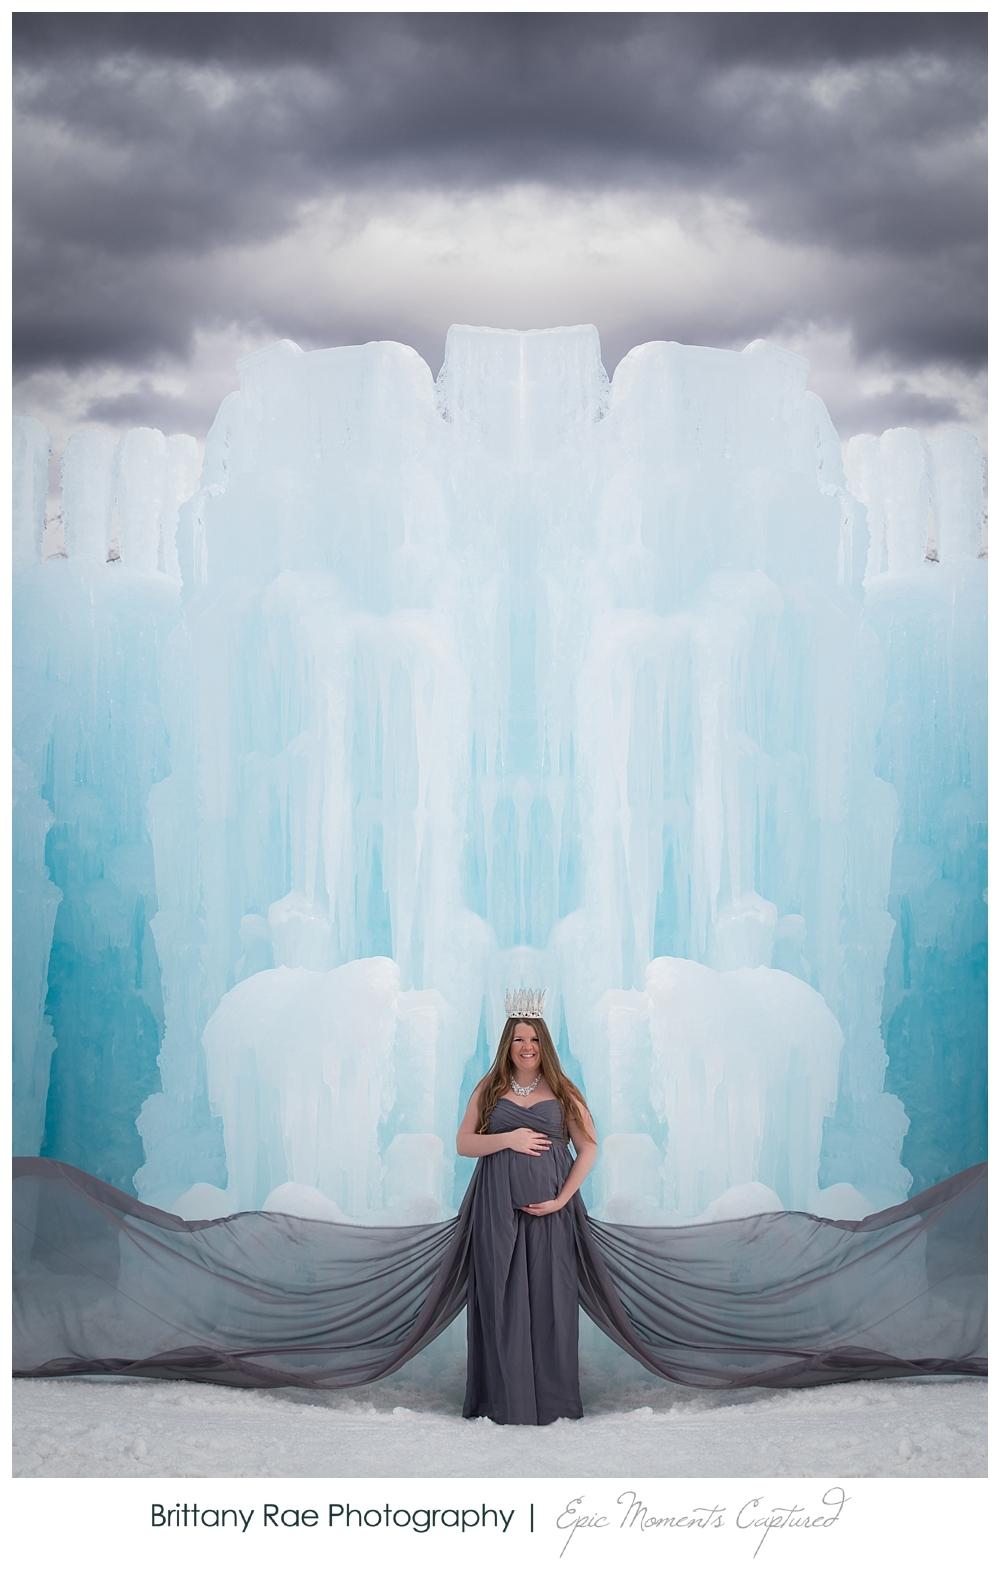 020216-Jamie-at-Ice-Castles-6_WEB-Maine-Wedding-and-Portrait-Photographer.jpg